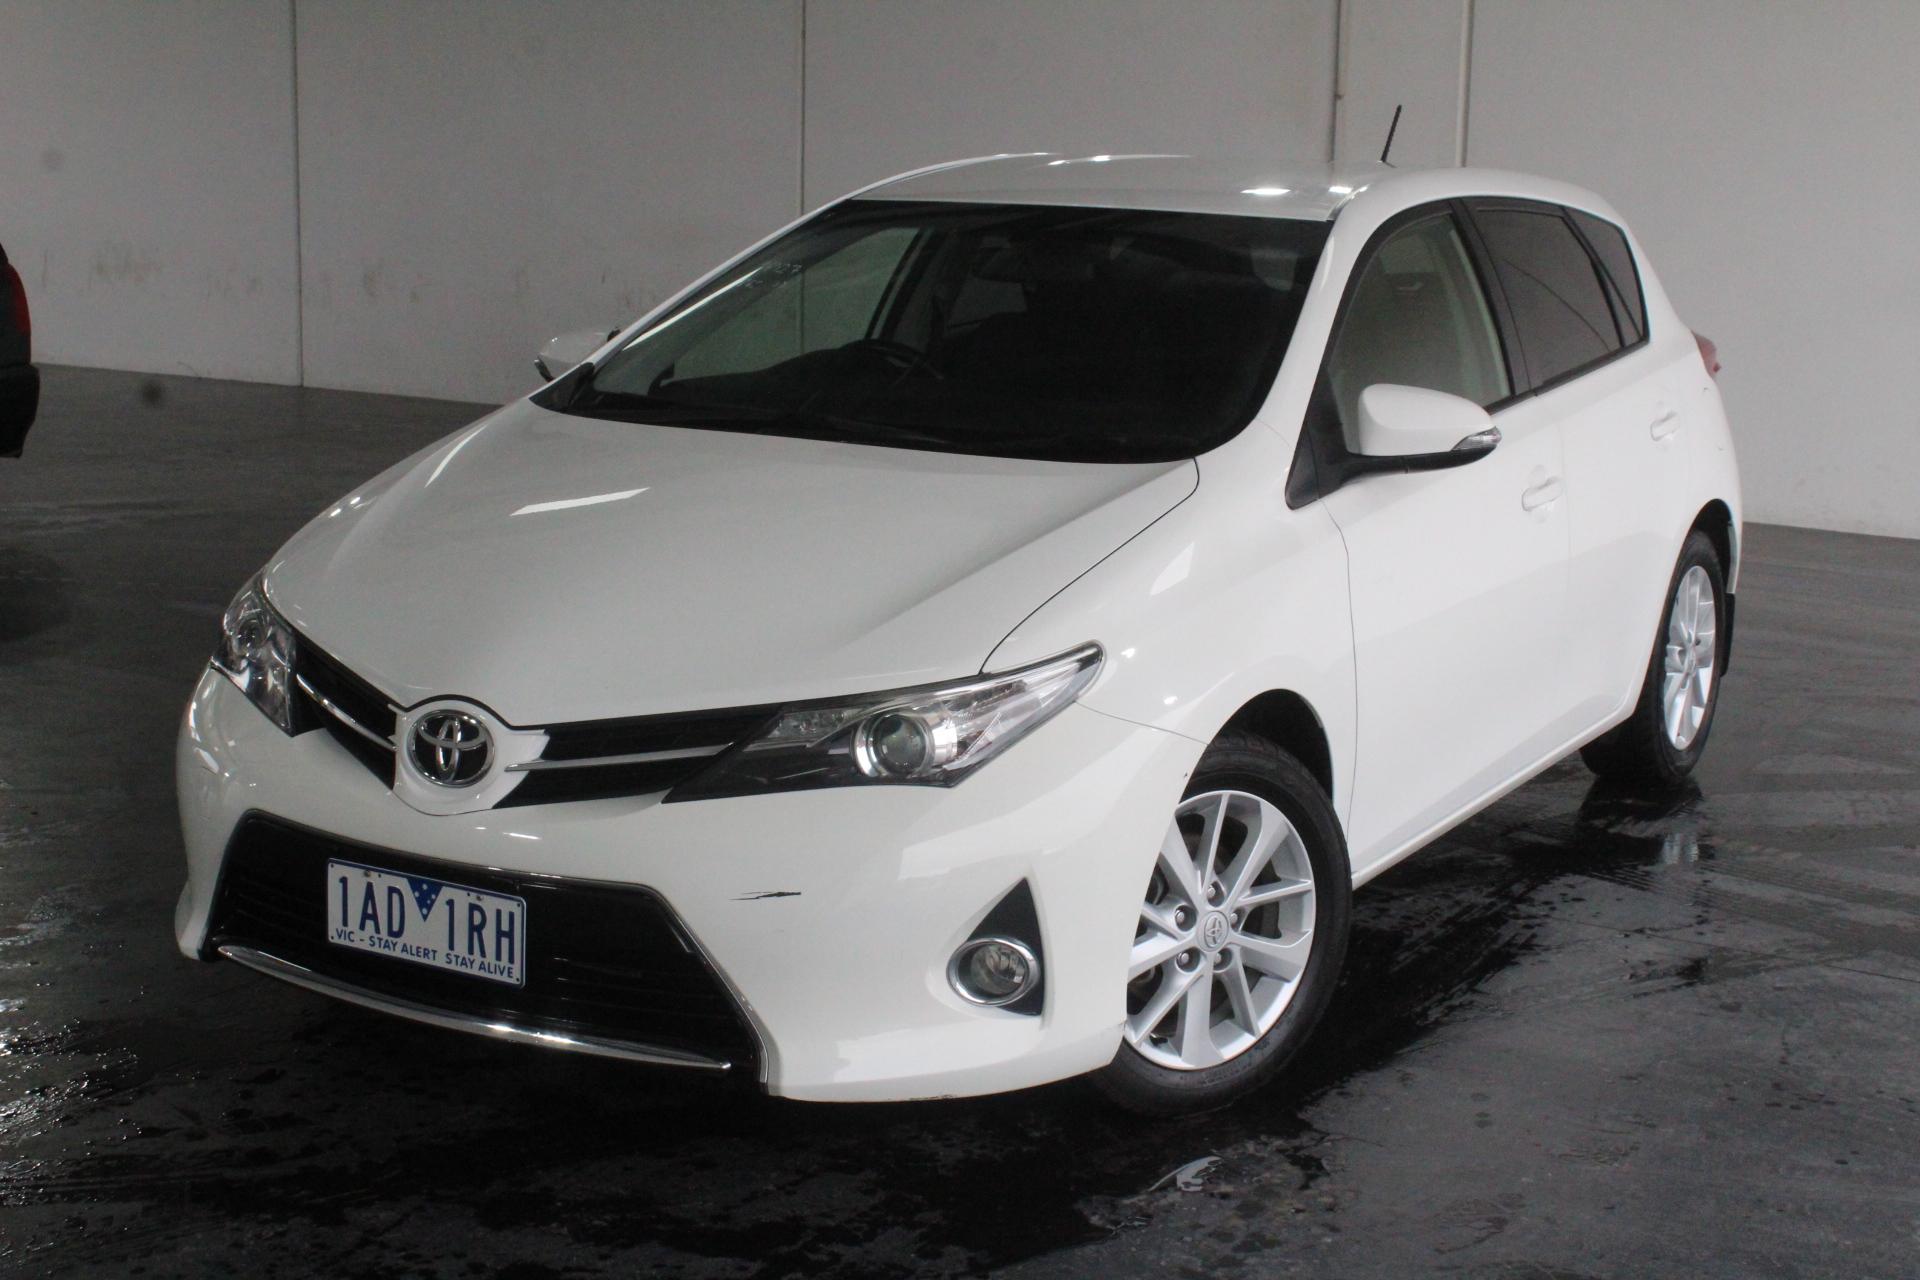 2013 Toyota Corolla Ascent Sport ZRE182R CVT Hatchback (EX GOV)